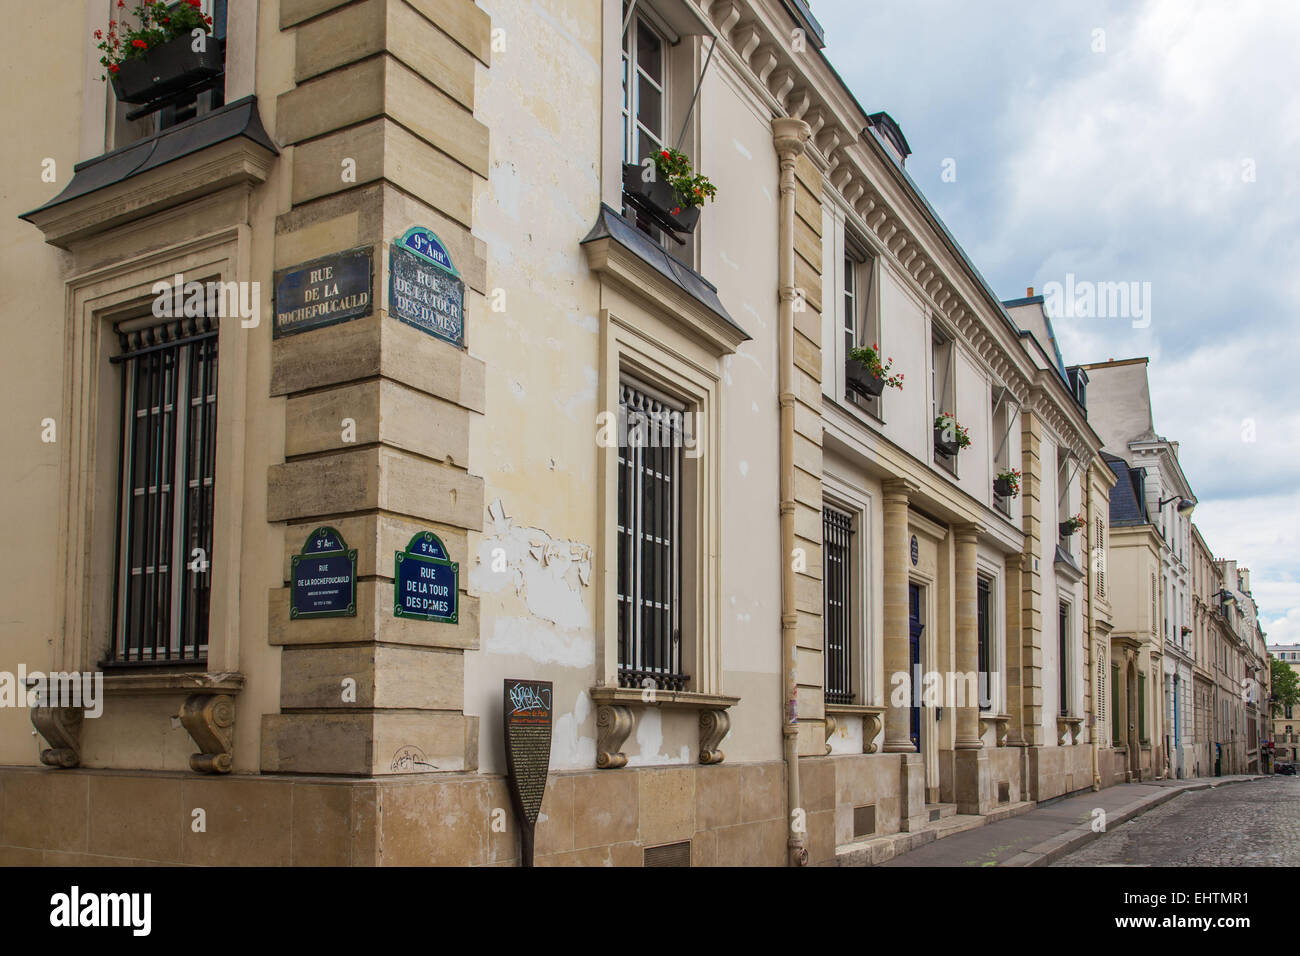 ILLUSTRATION OF THE CITY OF PARIS (75), ILE-DE-FRANCE, FRANCE - Stock Image